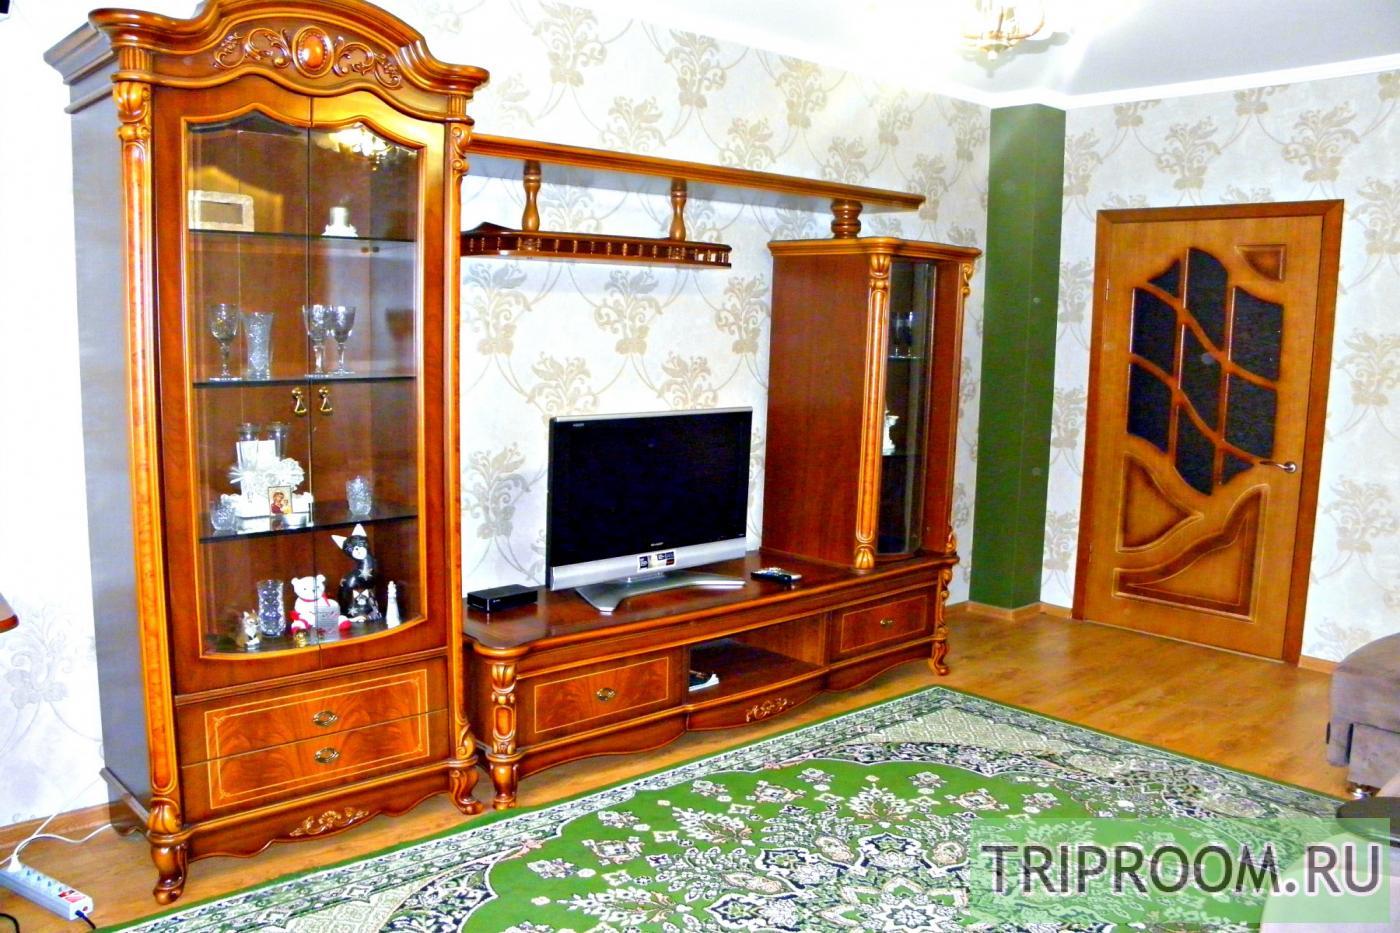 1-комнатная квартира посуточно (вариант № 18827), ул. Гвардейский переулок, фото № 14